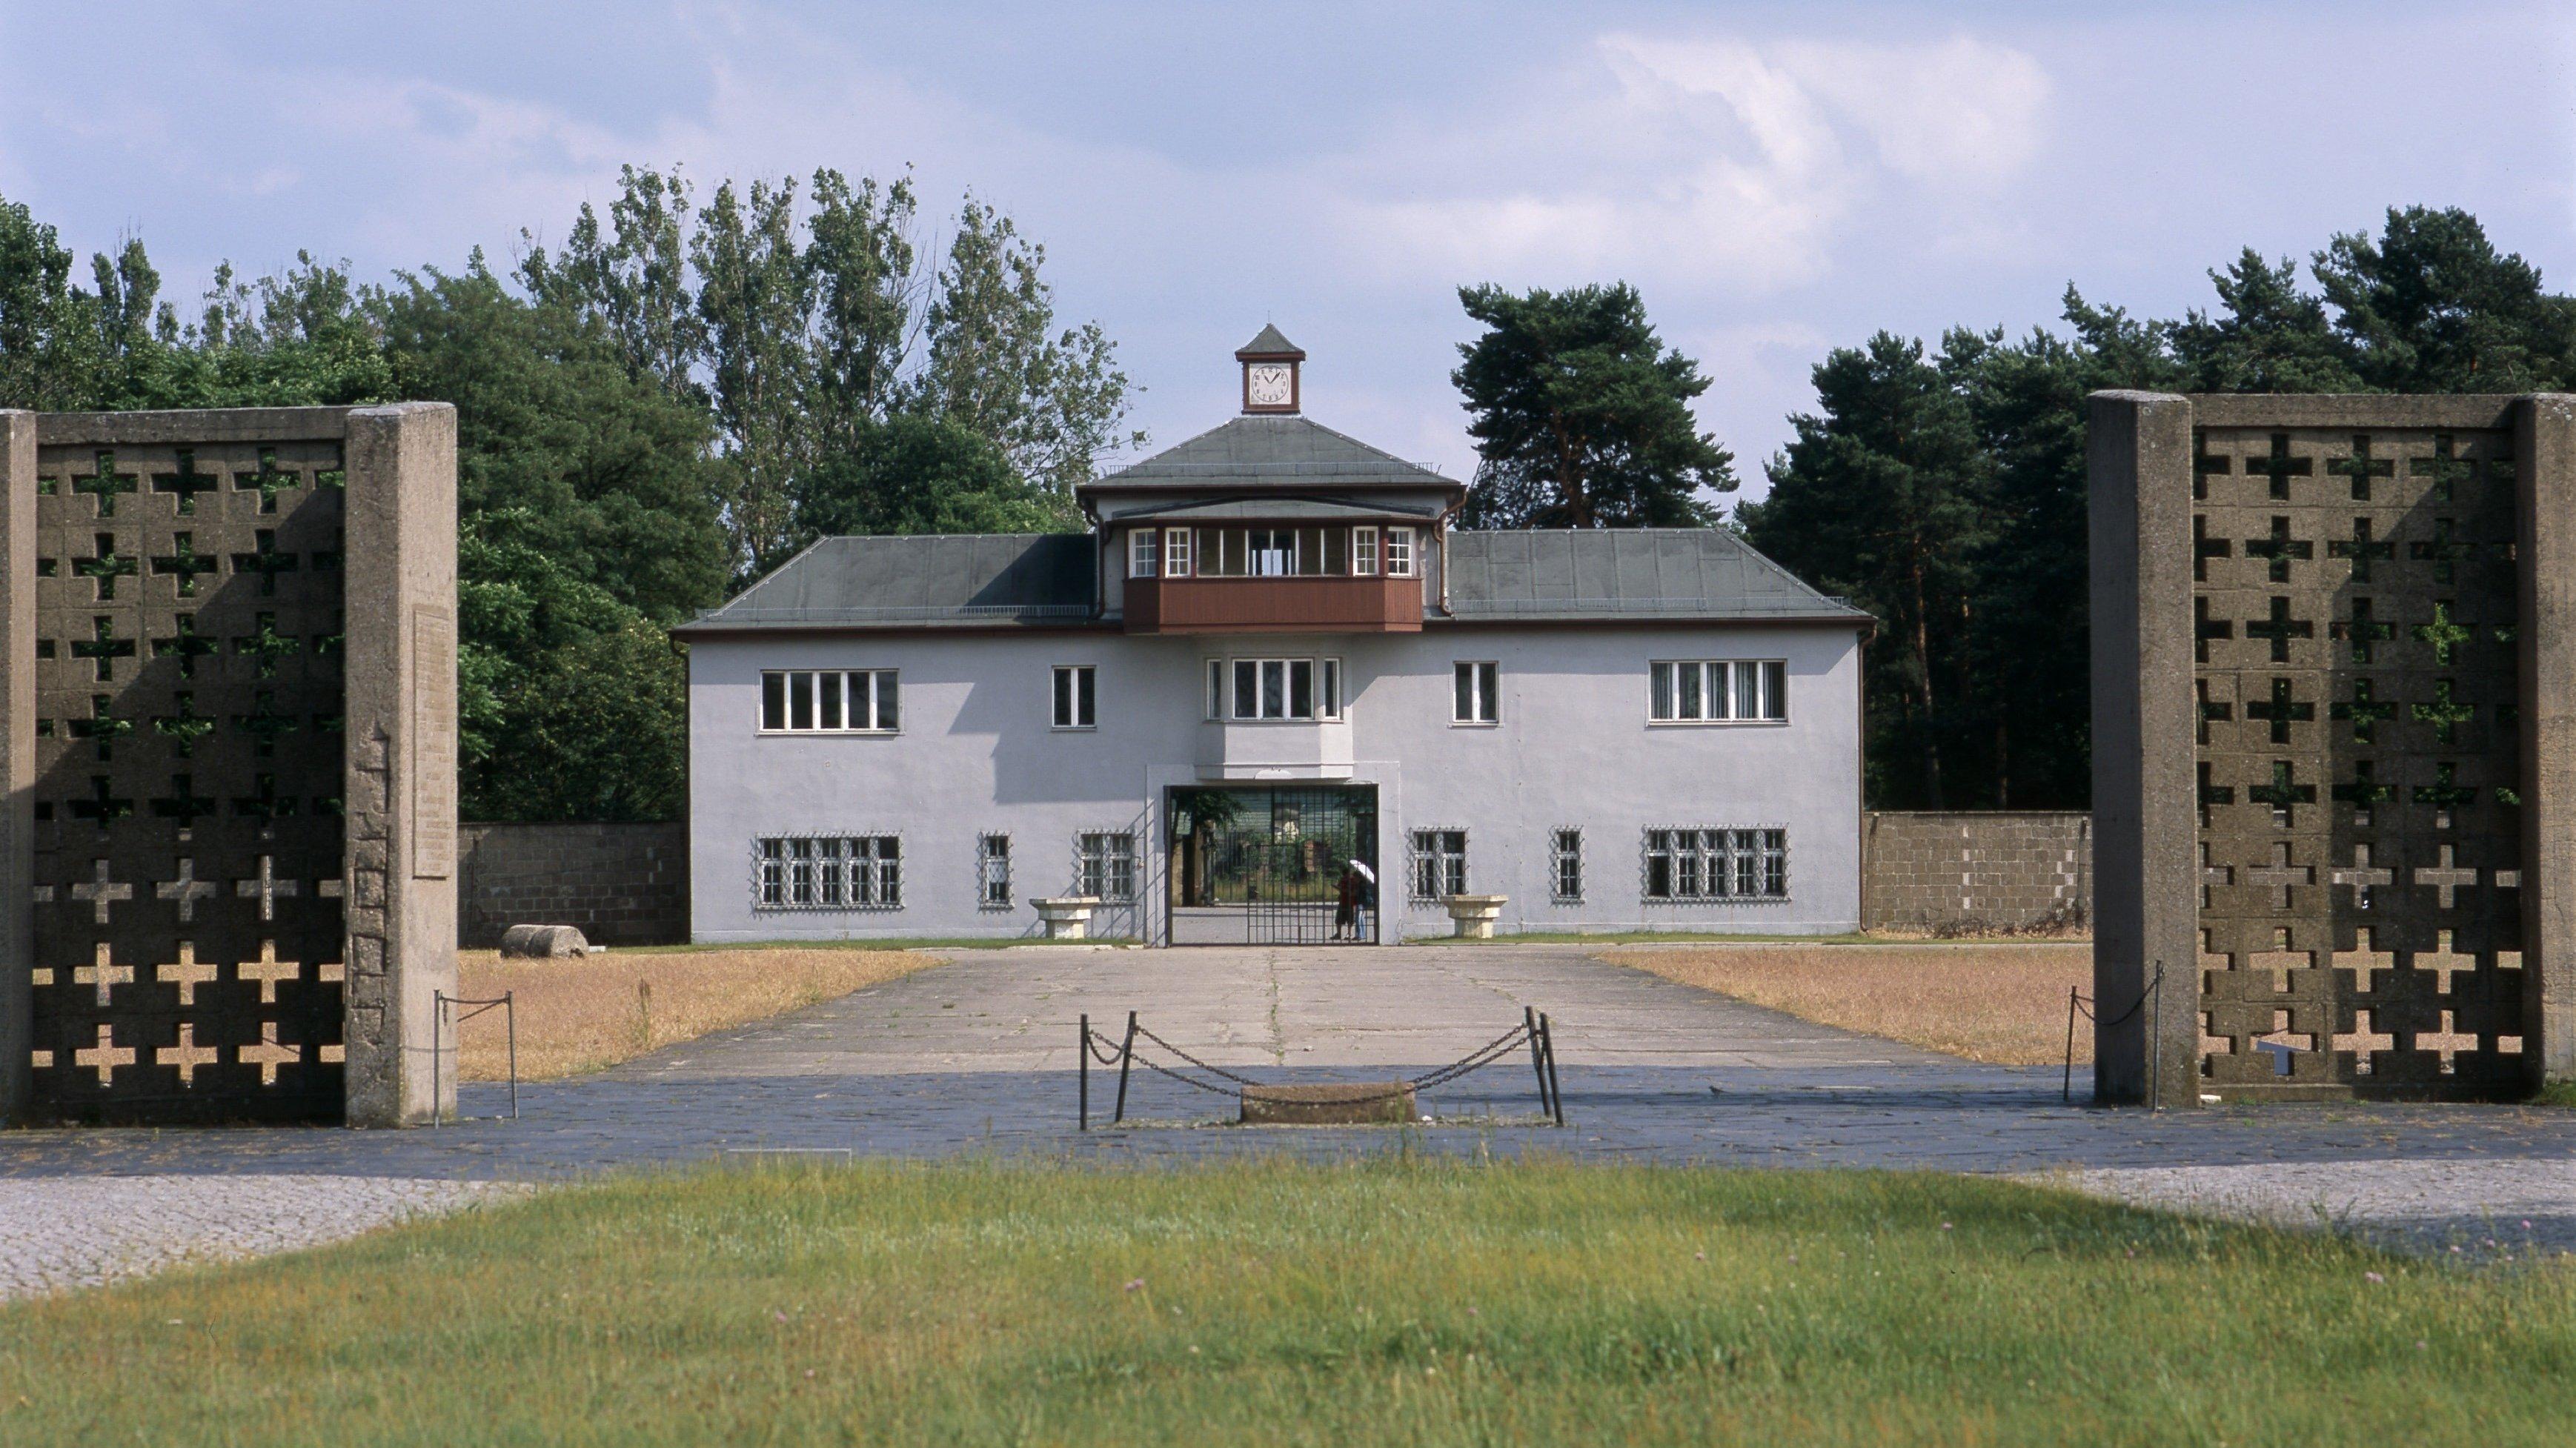 Germany, Brandenburg, Oranienburg: EntranceBuilding to the concentration camp (KZ) Sachsenhausen.